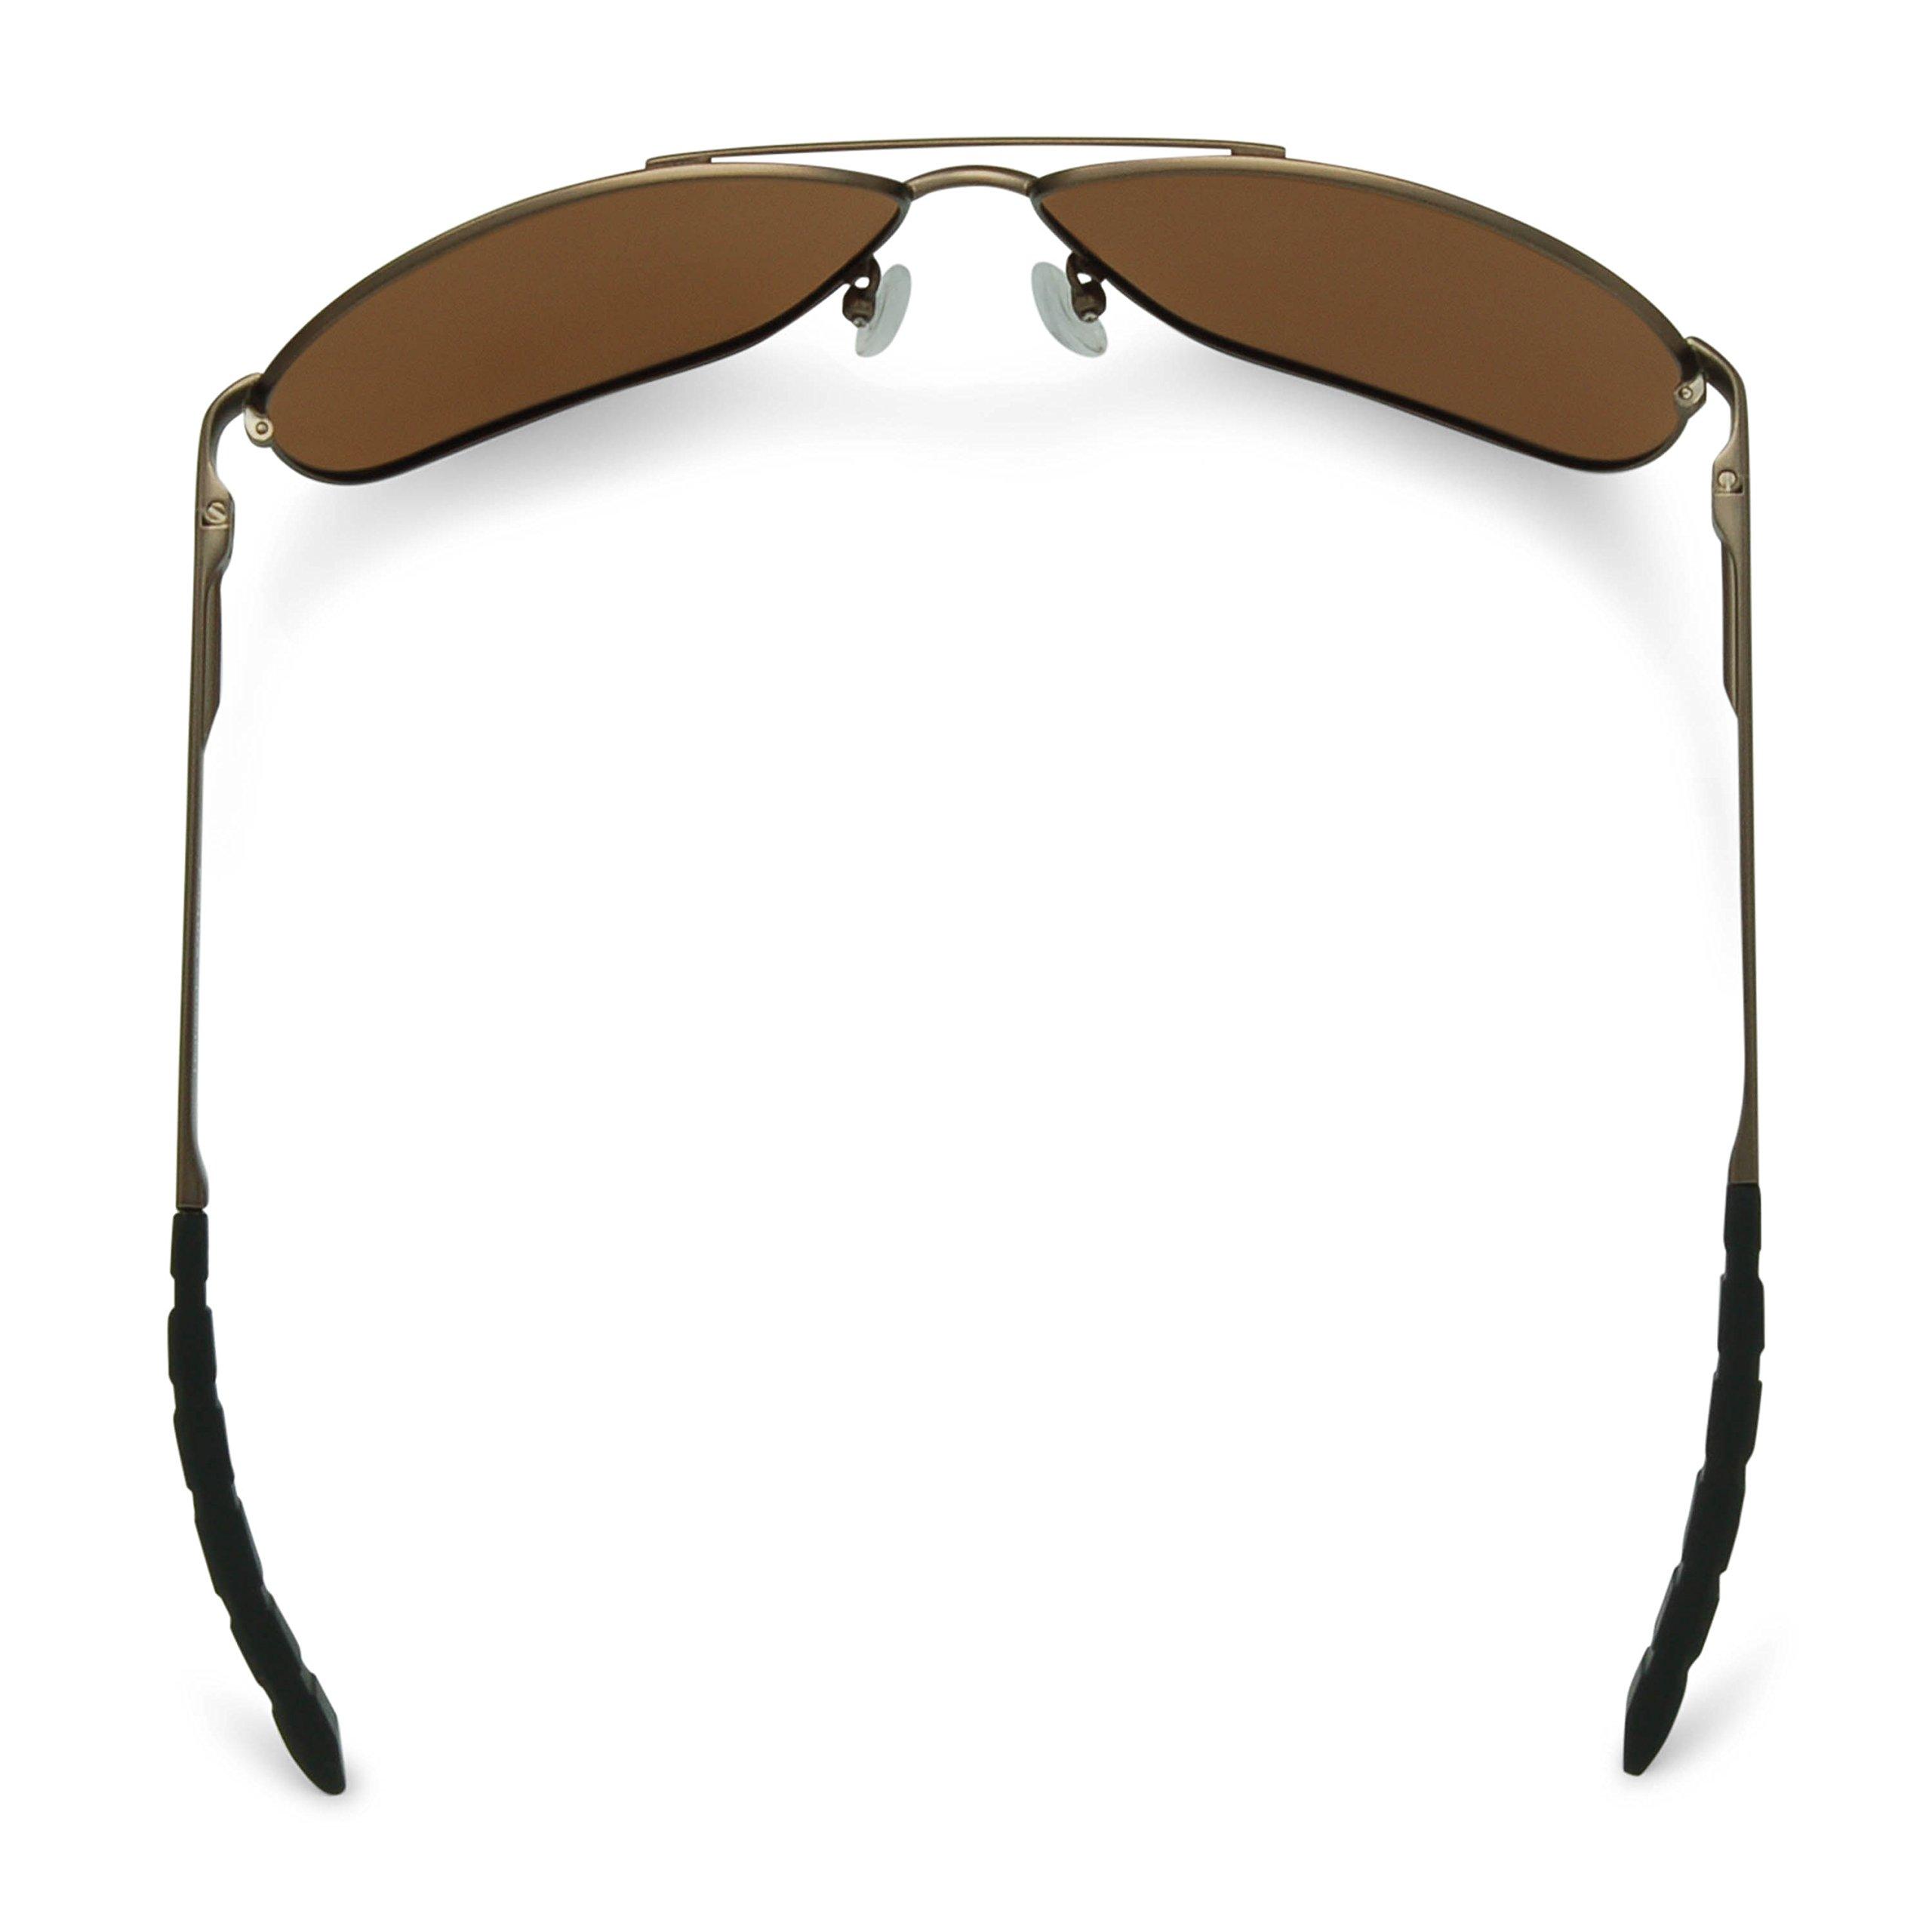 Flying Fisherman 7816CA Highlander Polarized Sunglasses, Copper Frame, Amber Lens